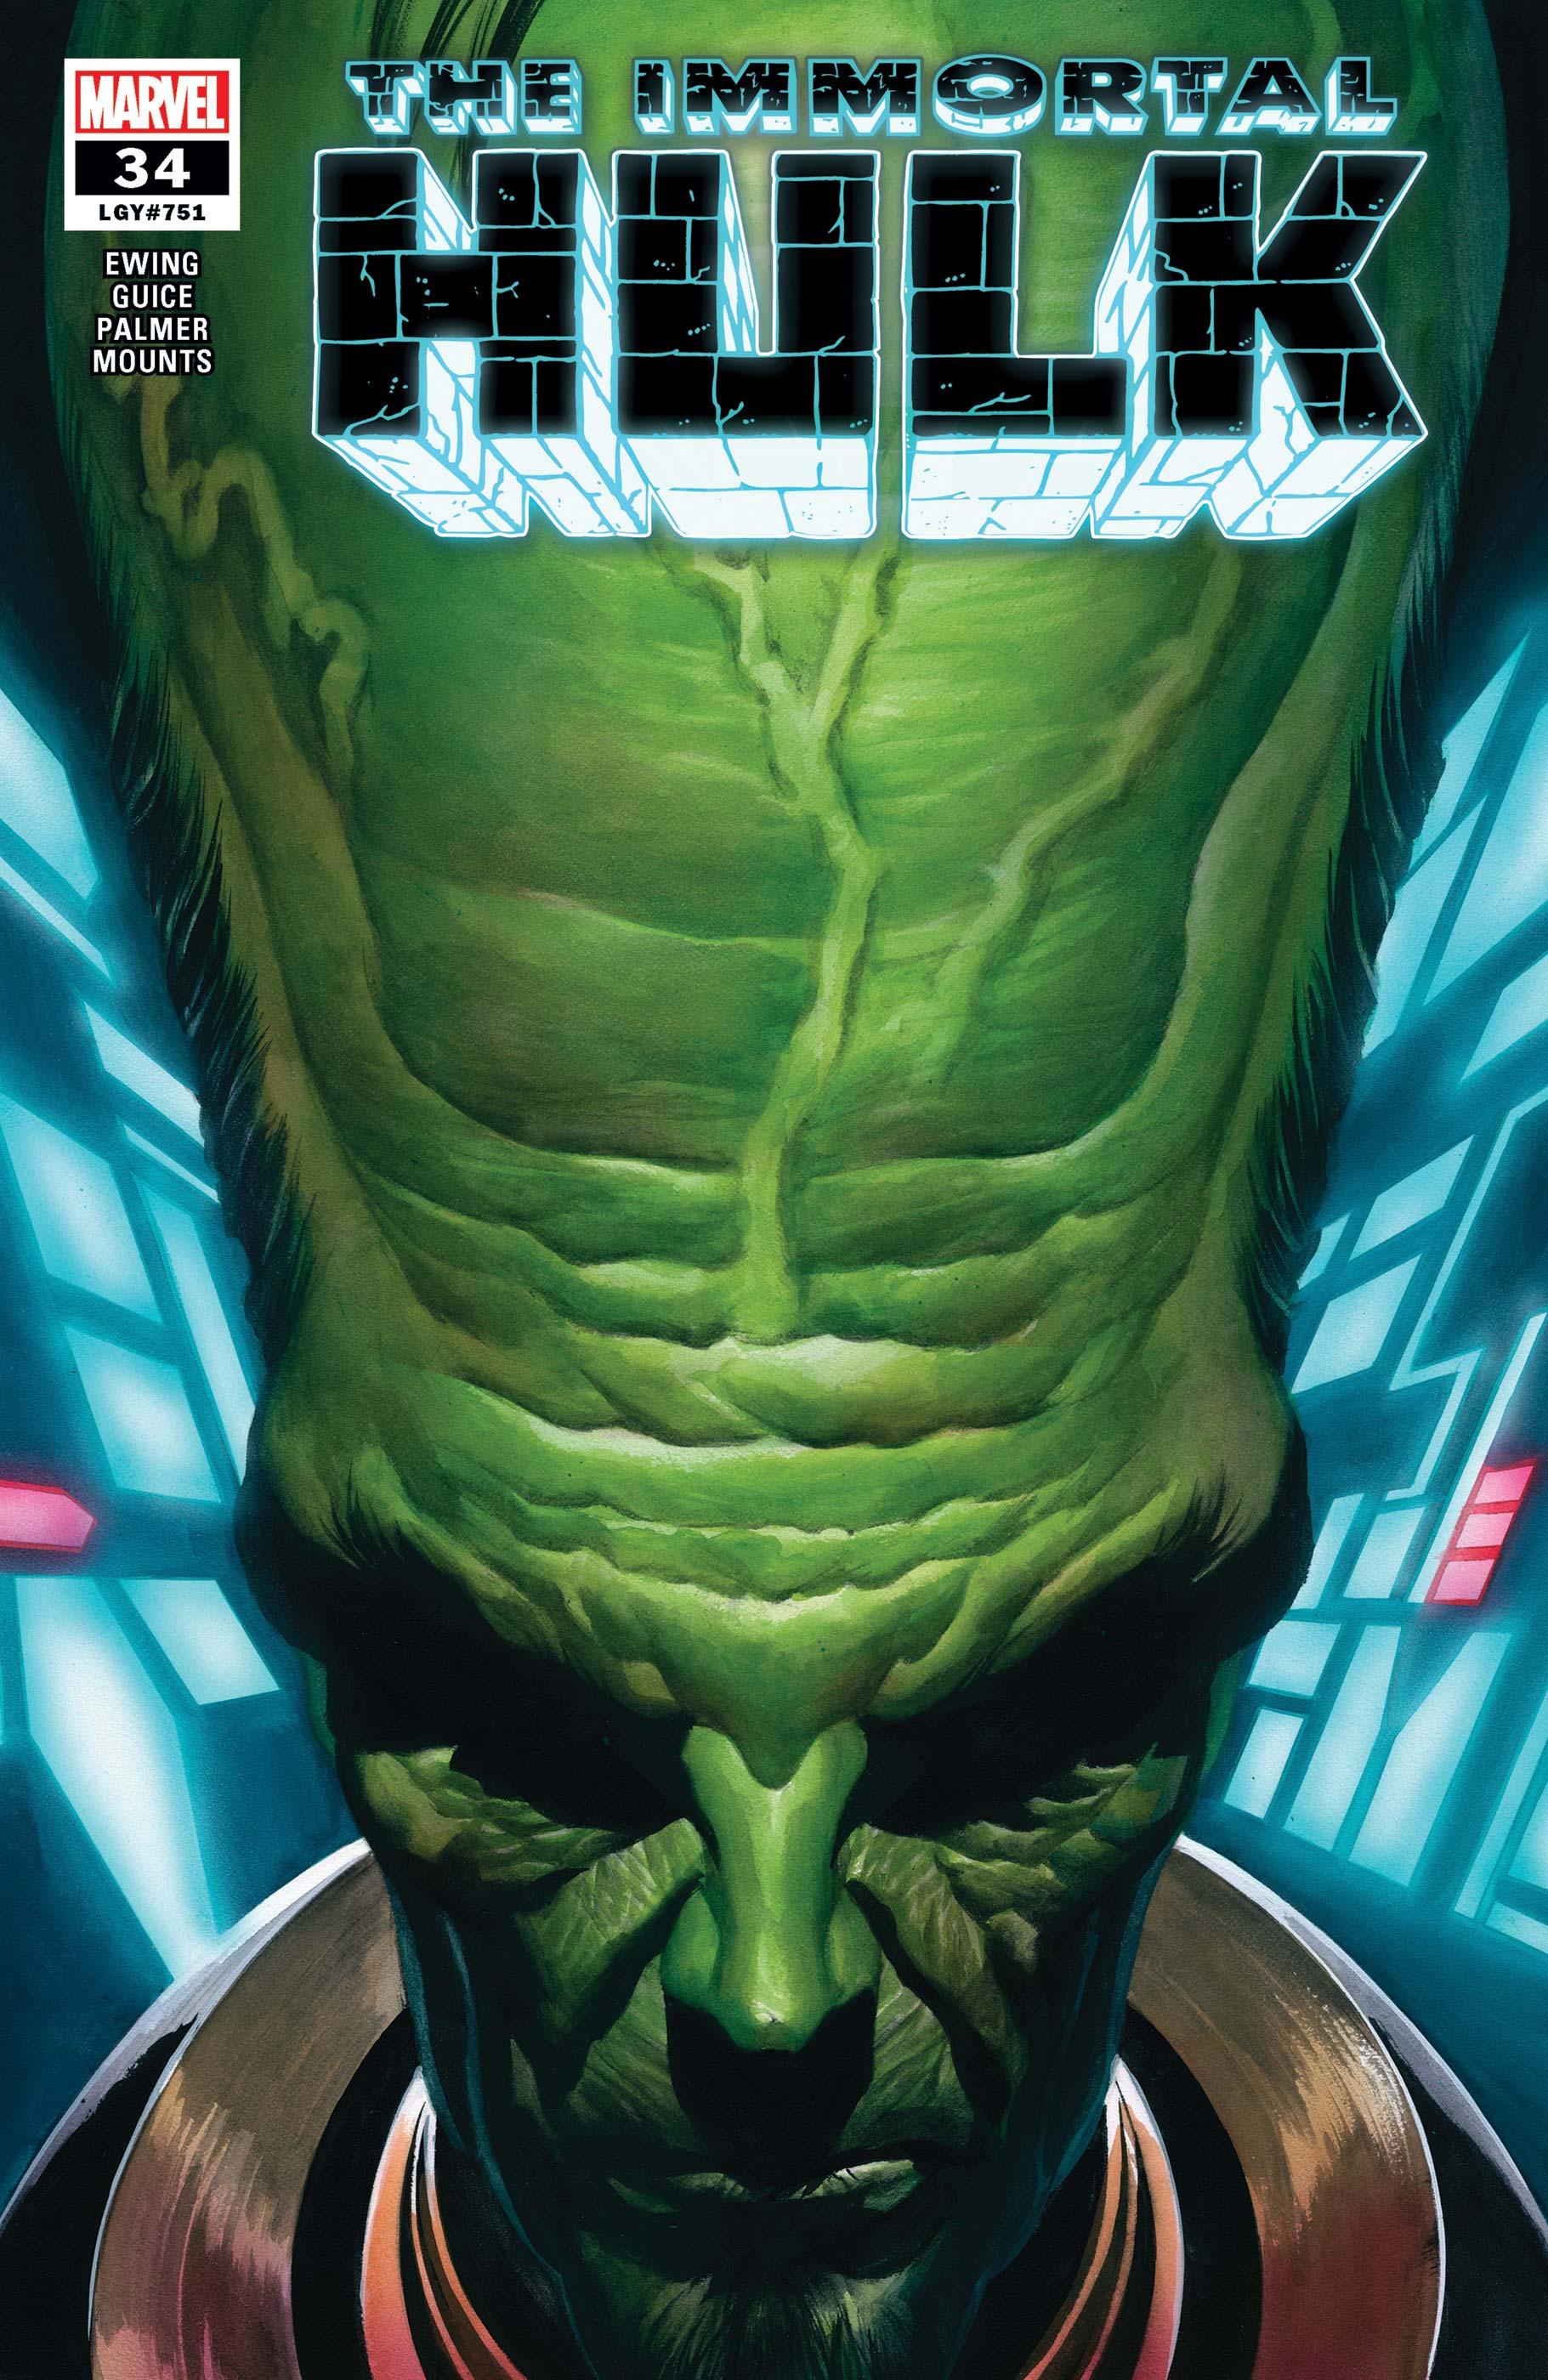 Immortal Hulk (2018) #34 | Comic Issues | Marvel